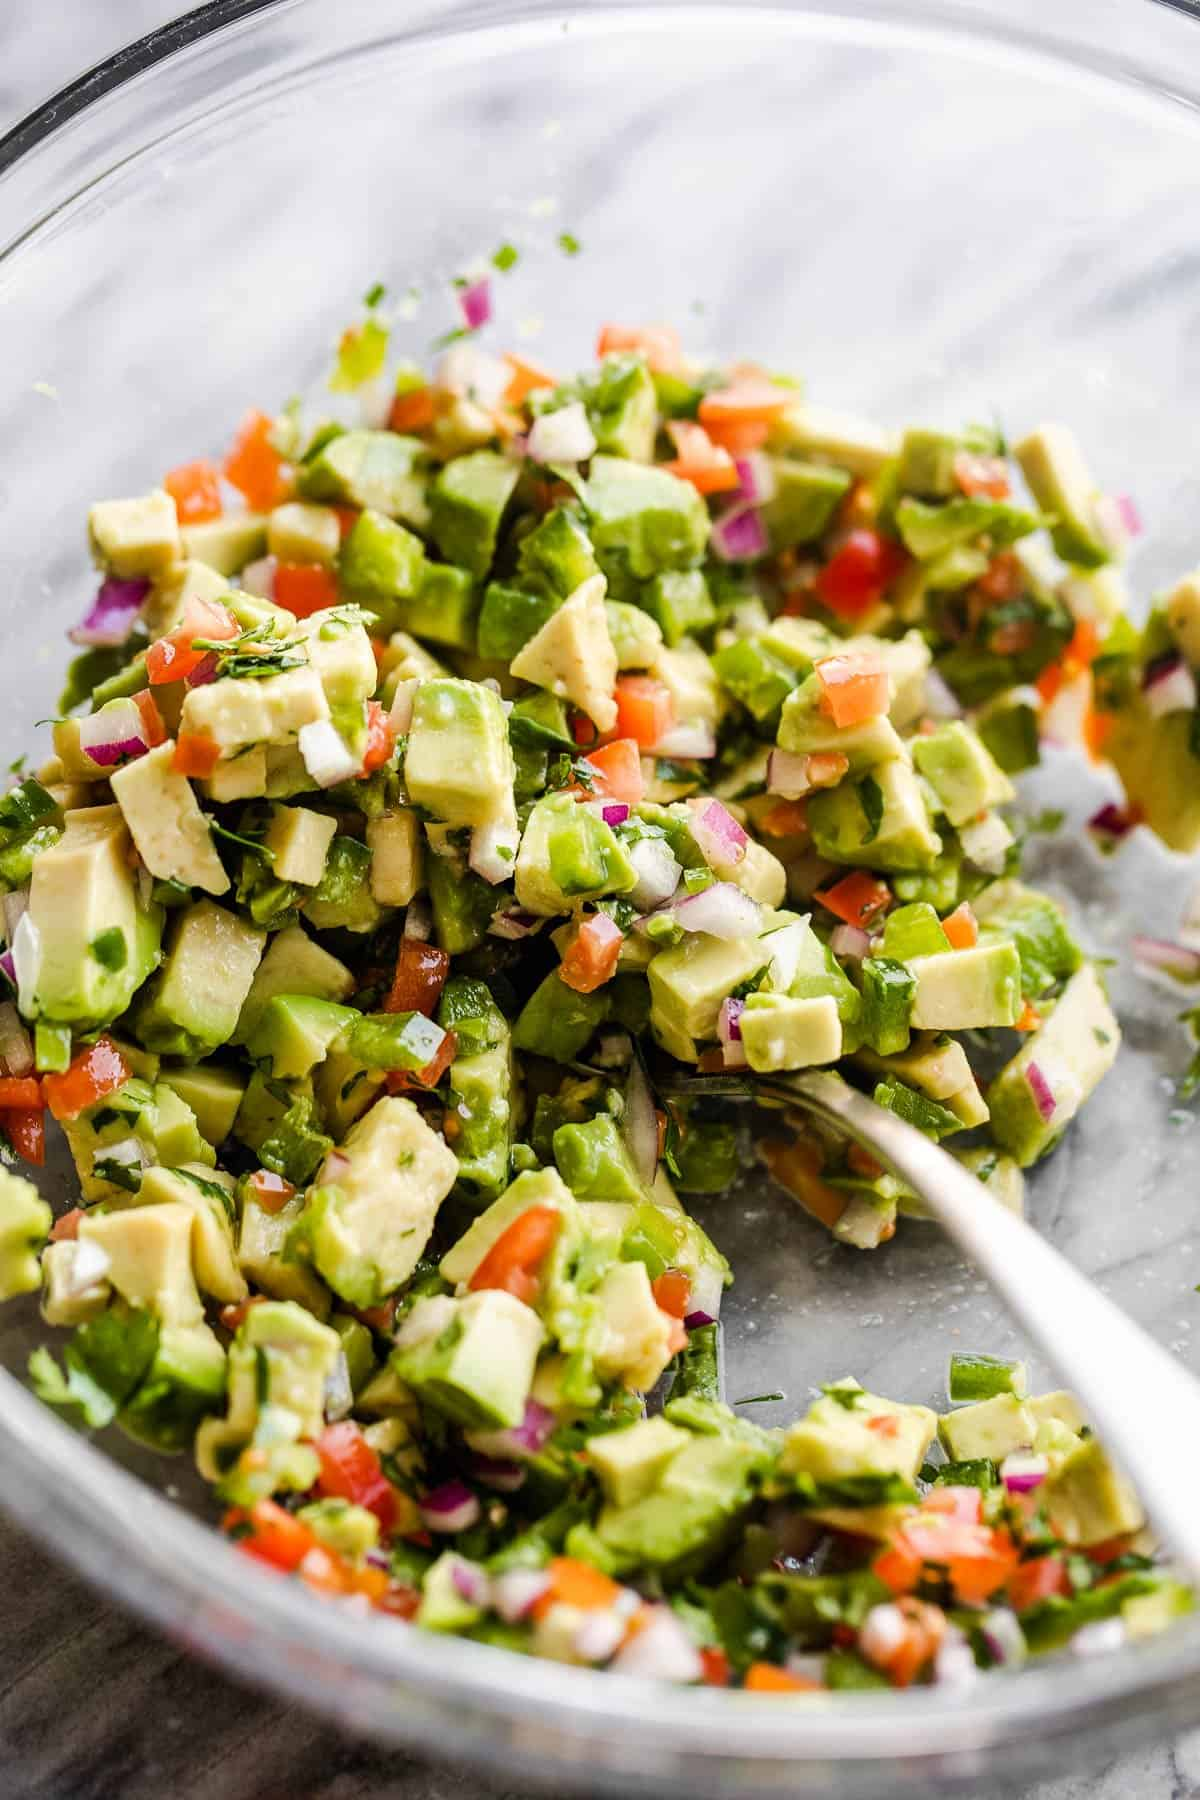 preparing avocado salsa in a glass bowl